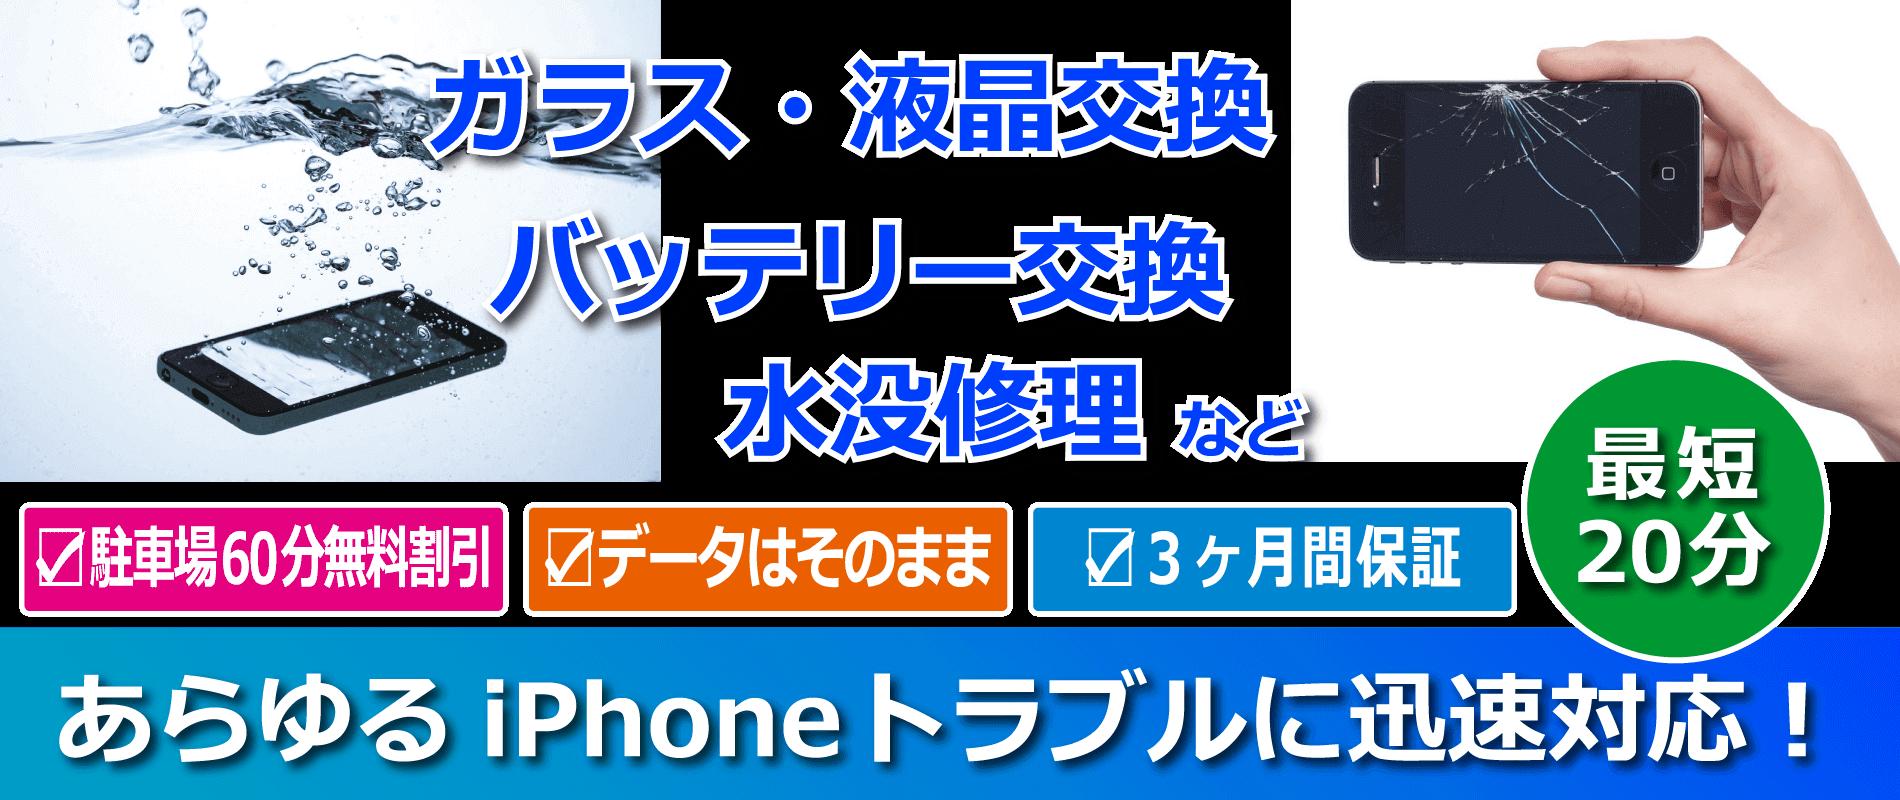 iPhoneの故障トラブルに迅速に修理対応!ガラス・液晶交換・バッテリー交換・水没修理など倉敷でアイホン修理ならお任せ下さい!データそのまま 3ヶ月保証